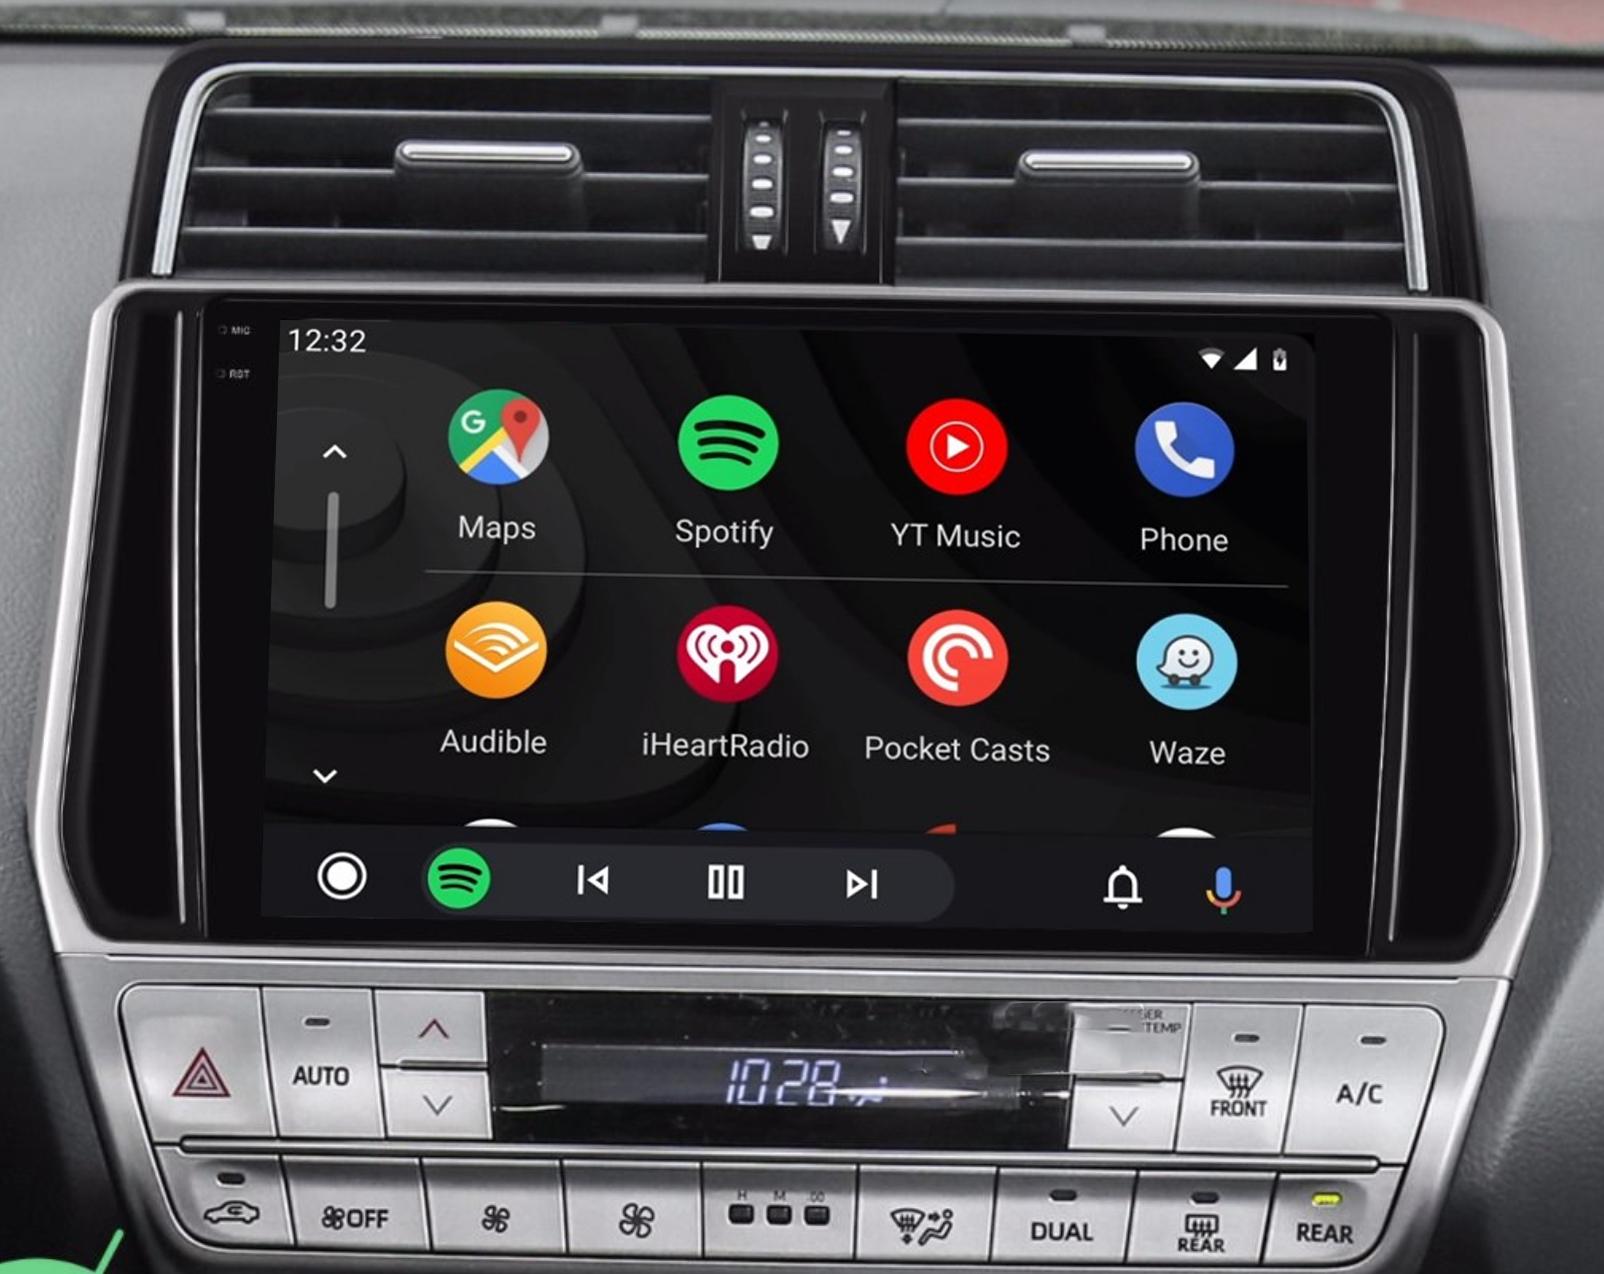 Ecran tactile QLED Android 11.0 + Apple Carplay sans fil Toyota Land Cruiser depuis 2018